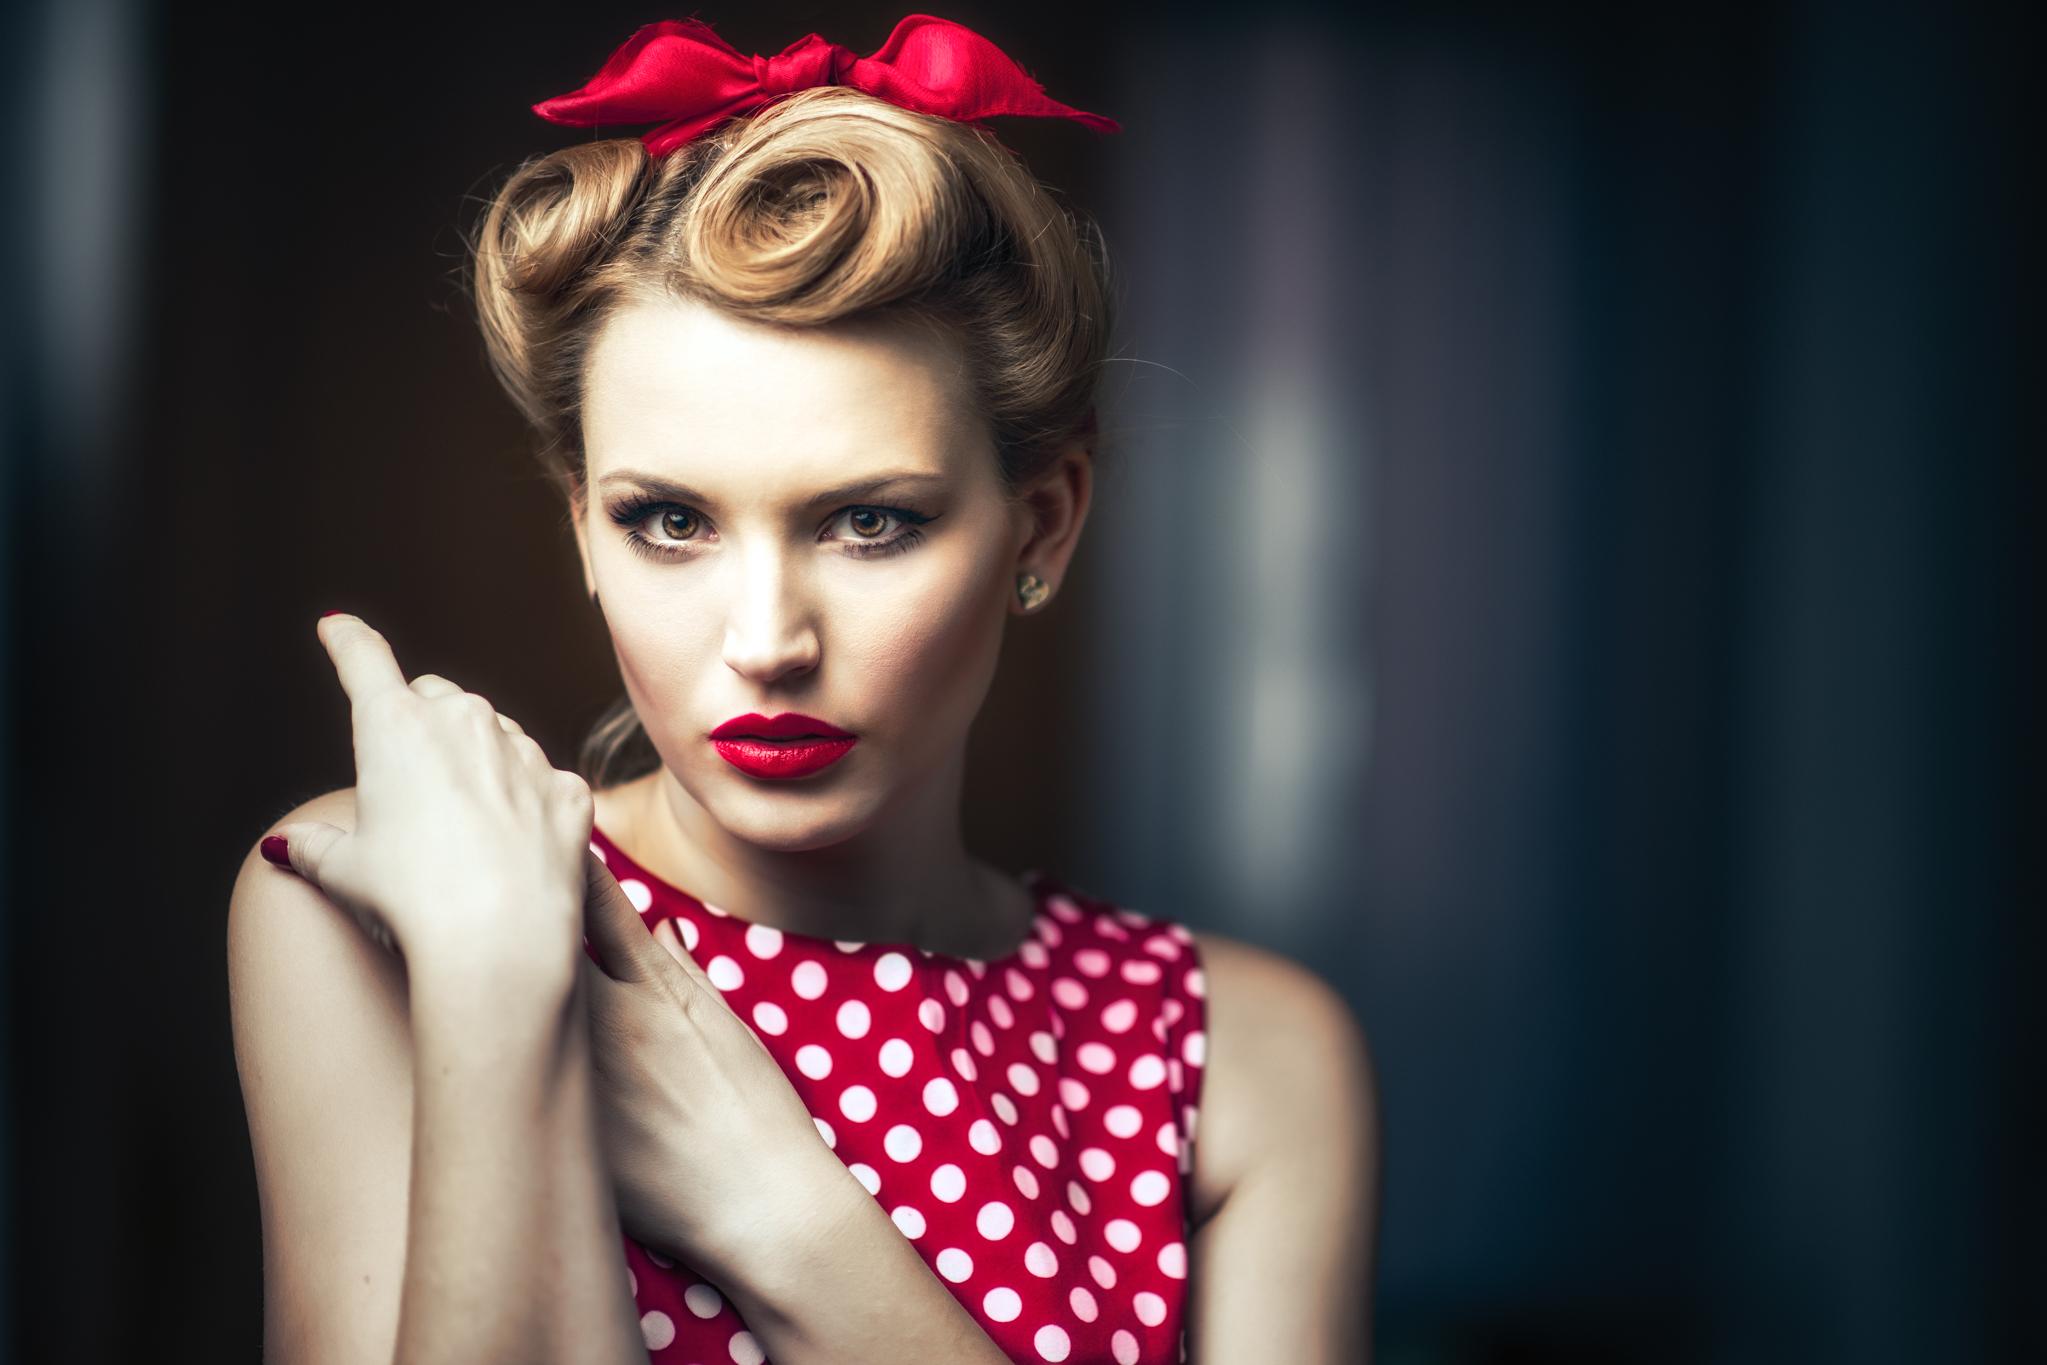 Personal Coaching – Portrait Photography